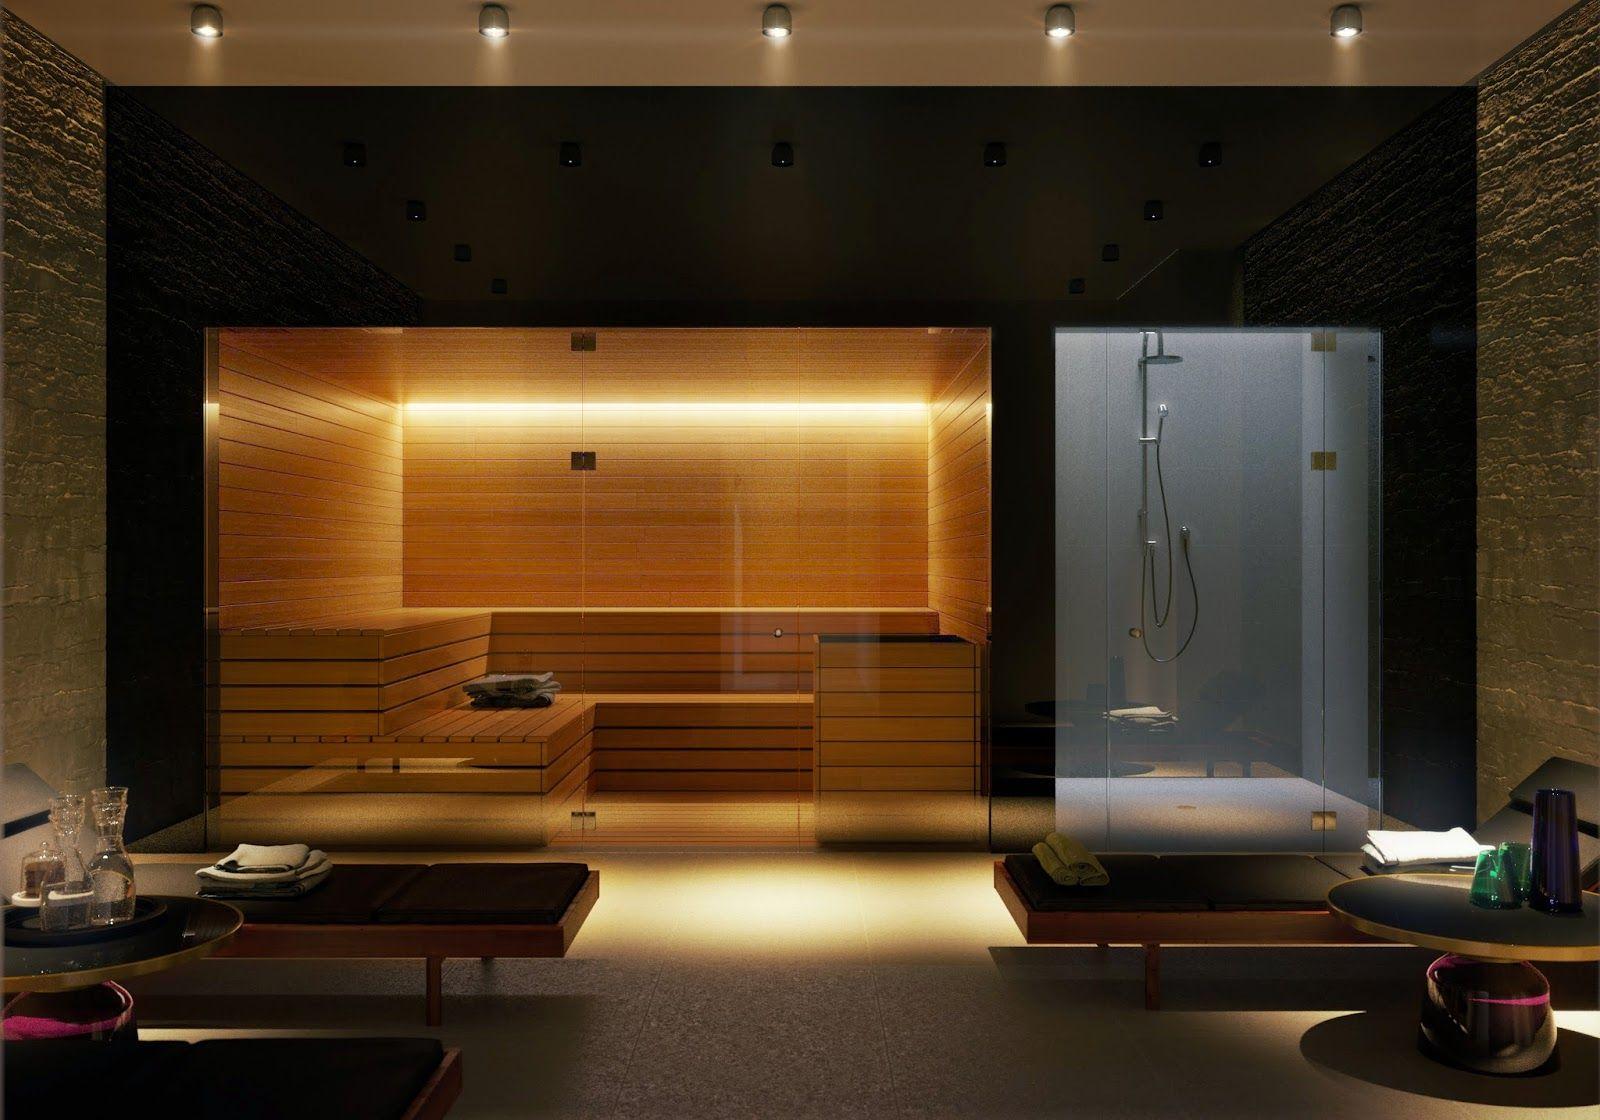 corona render for cinema 4d alpha1 cg interior exterior pinterest cinema 4d corona. Black Bedroom Furniture Sets. Home Design Ideas